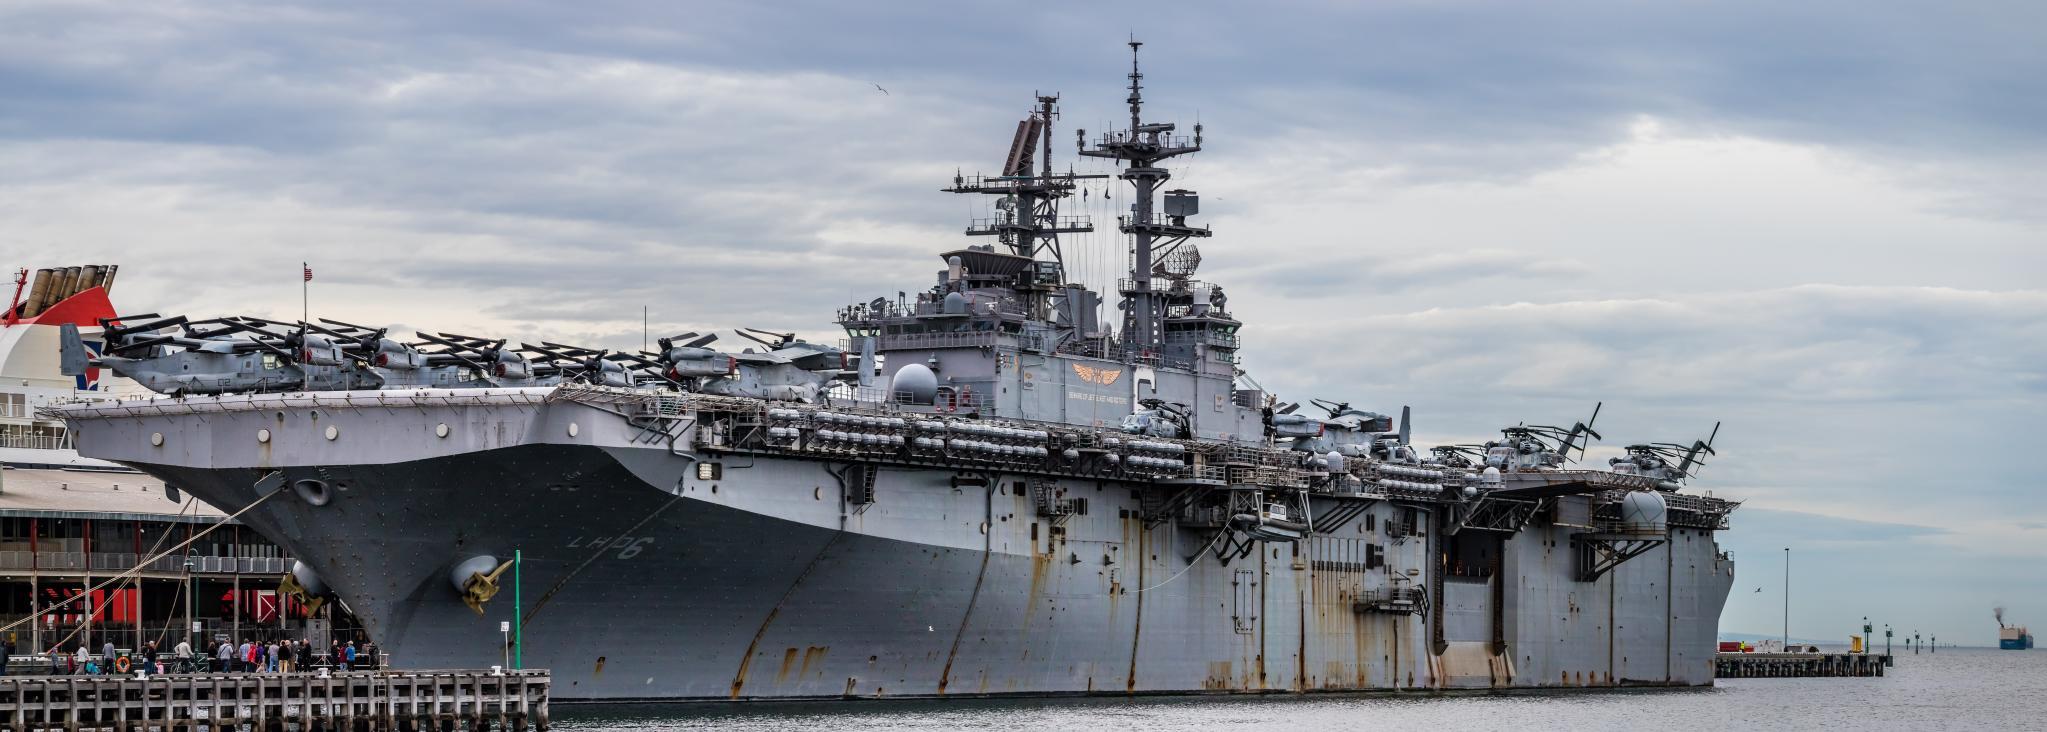 Amphibious assault ship (LHA - LHD - LPD) - Page 4 36890420002_5a58e43c73_o